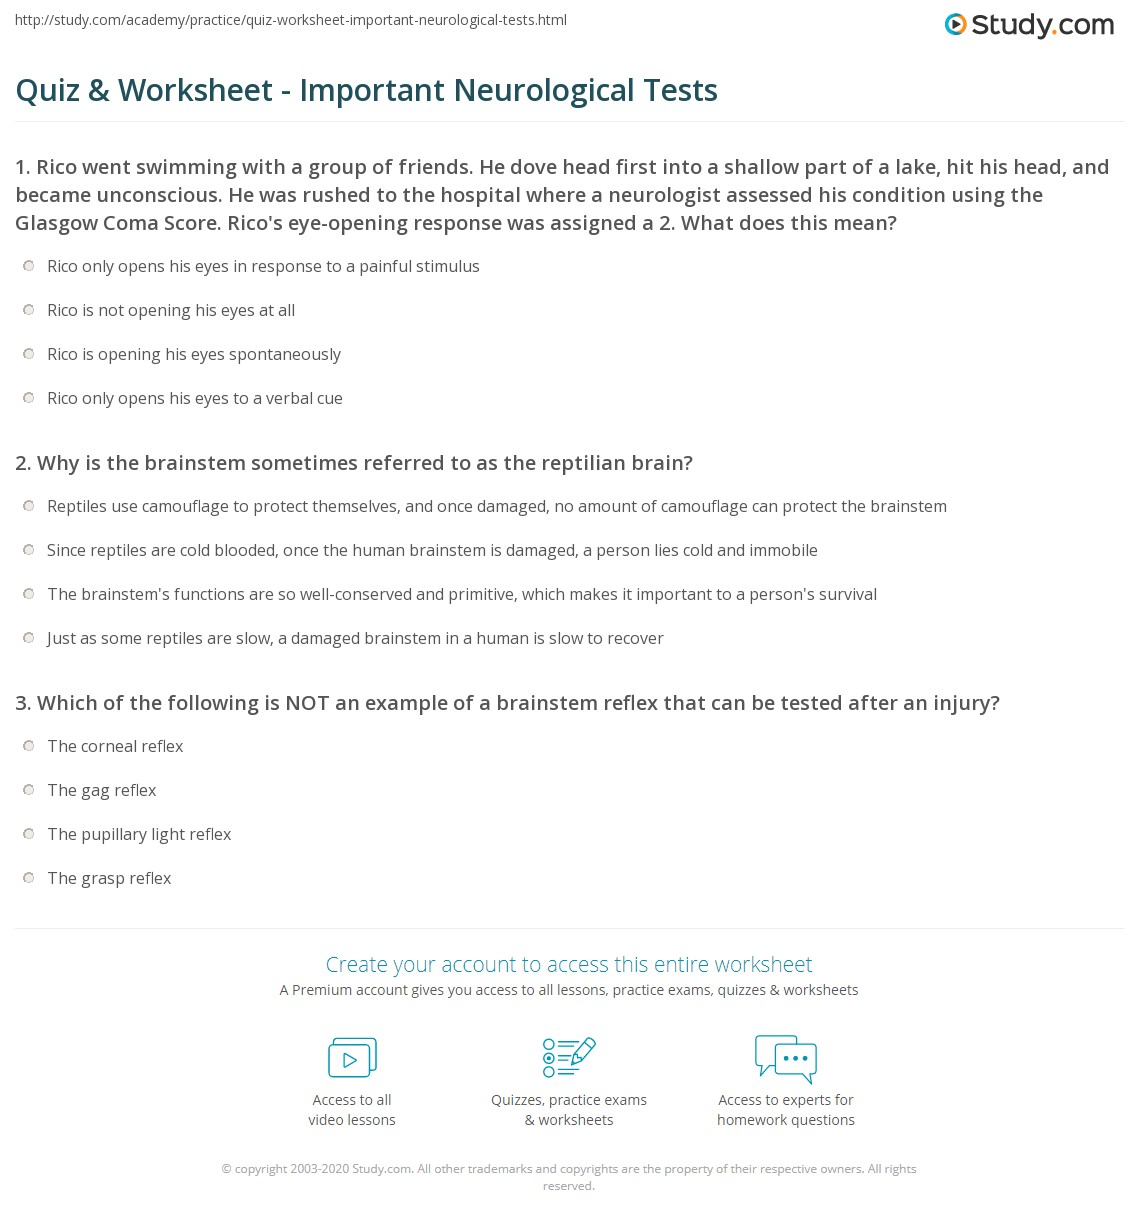 Quiz & Worksheet - Important Neurological Tests | Study.com